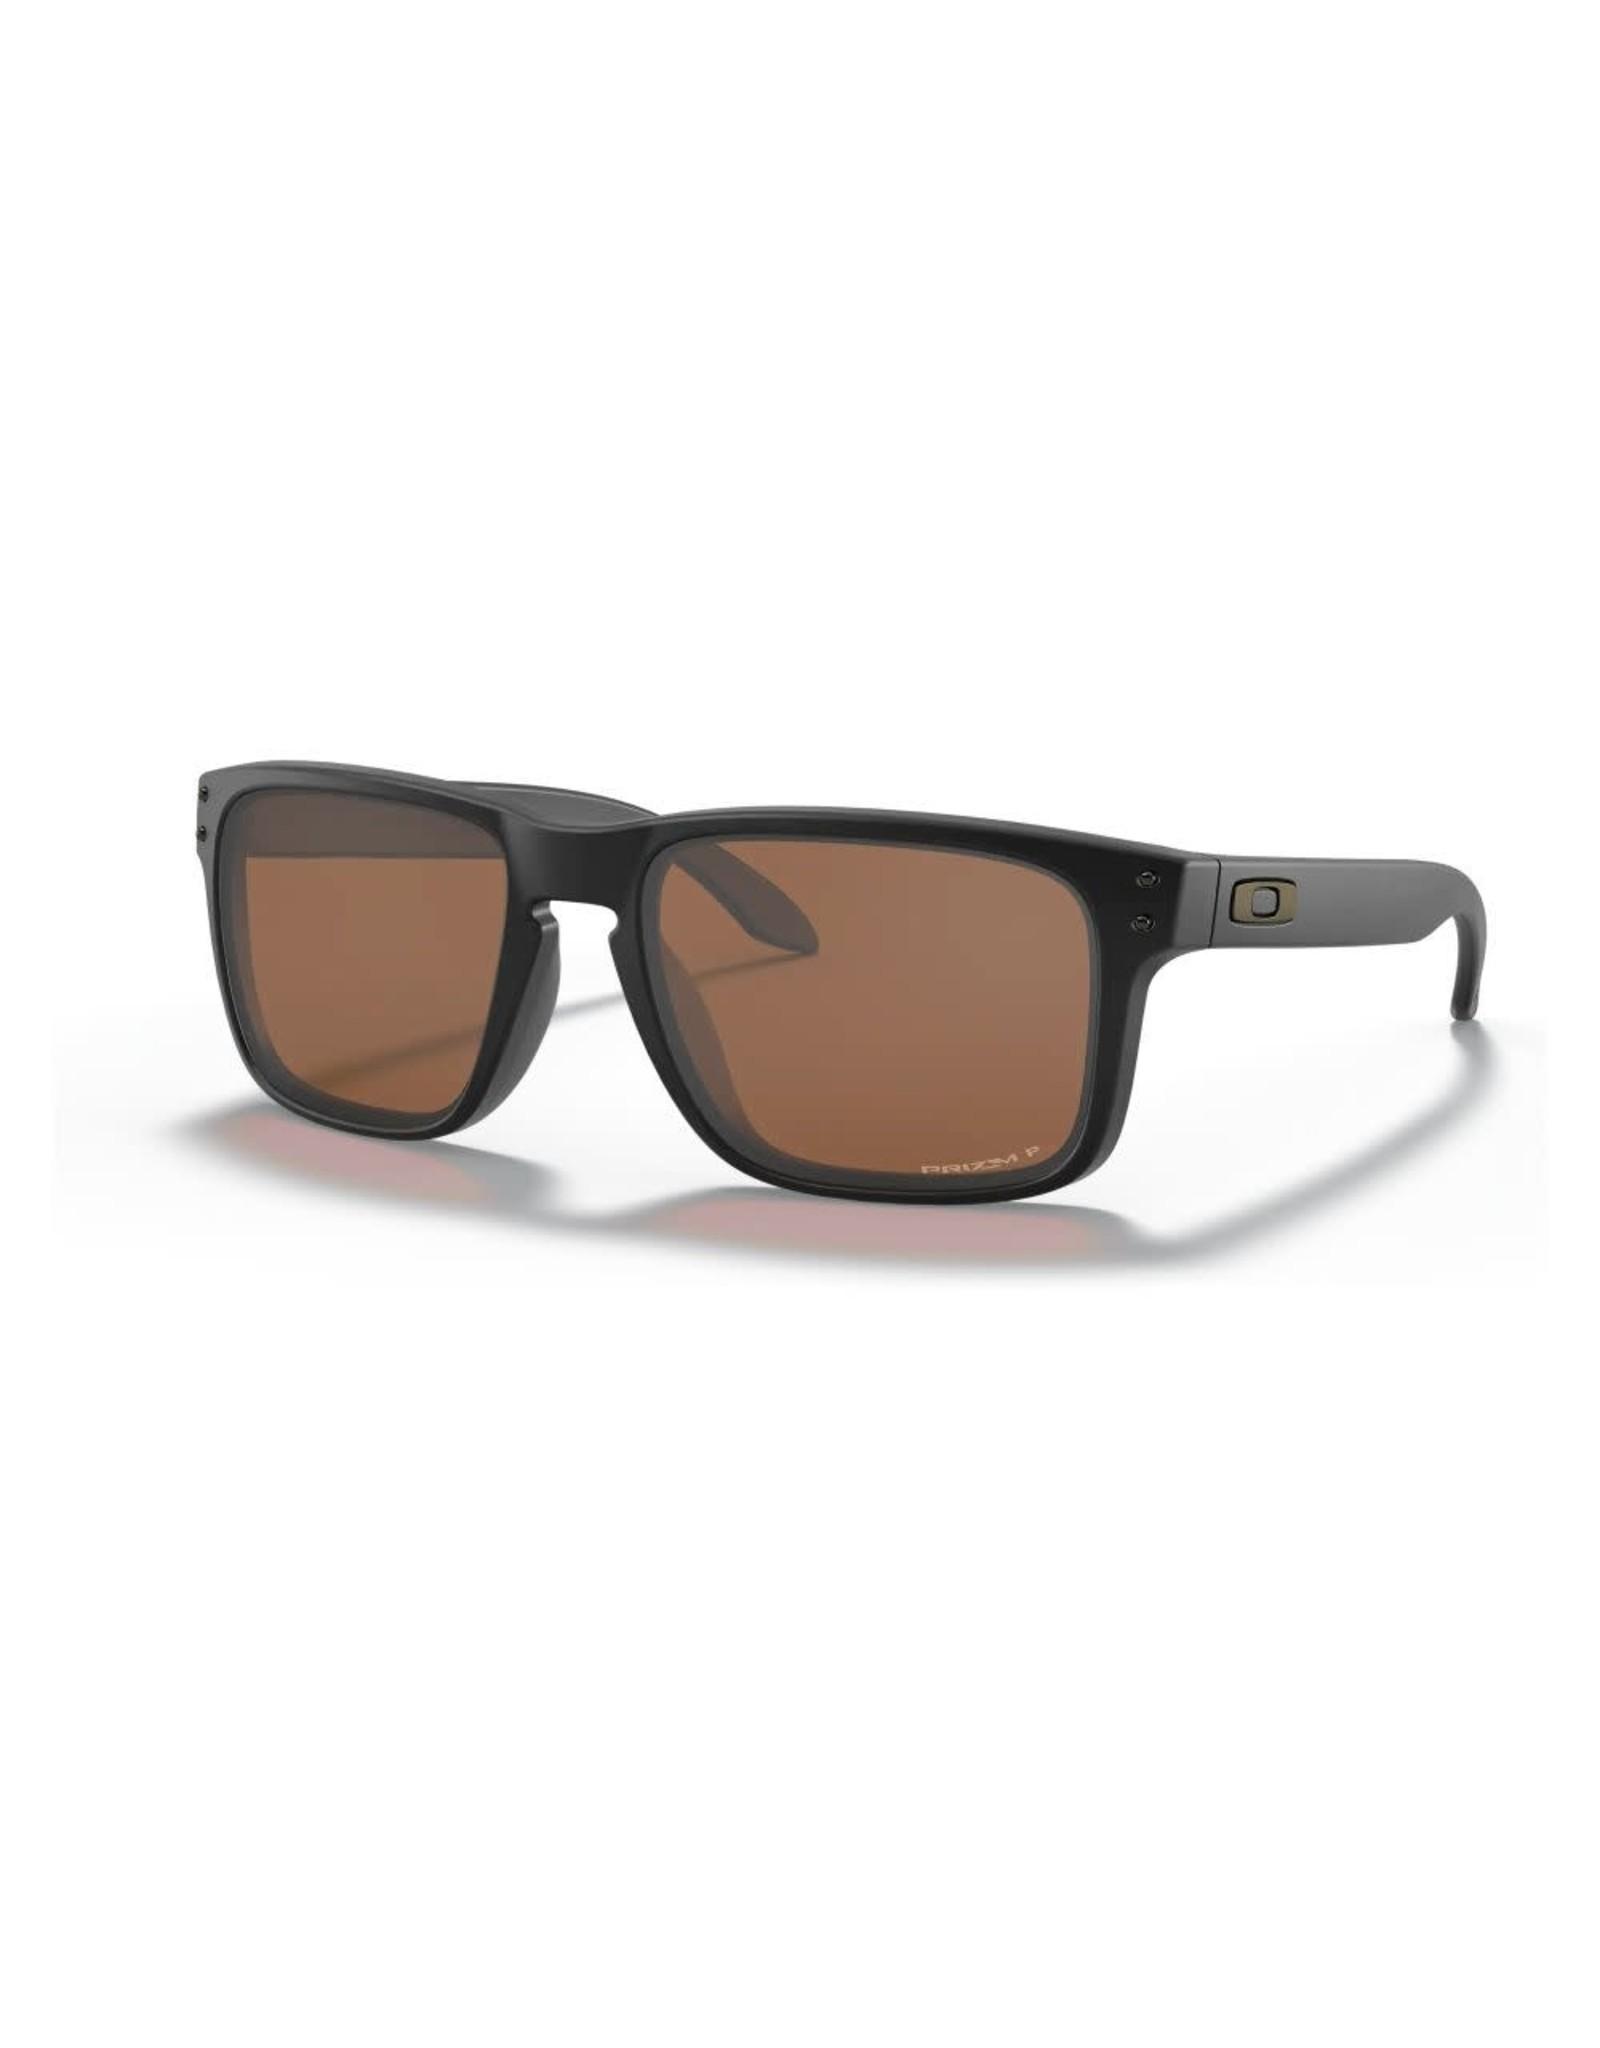 OAKLEY Oakley Holbrook lunette matte black prizm tungsten iridium polarisée